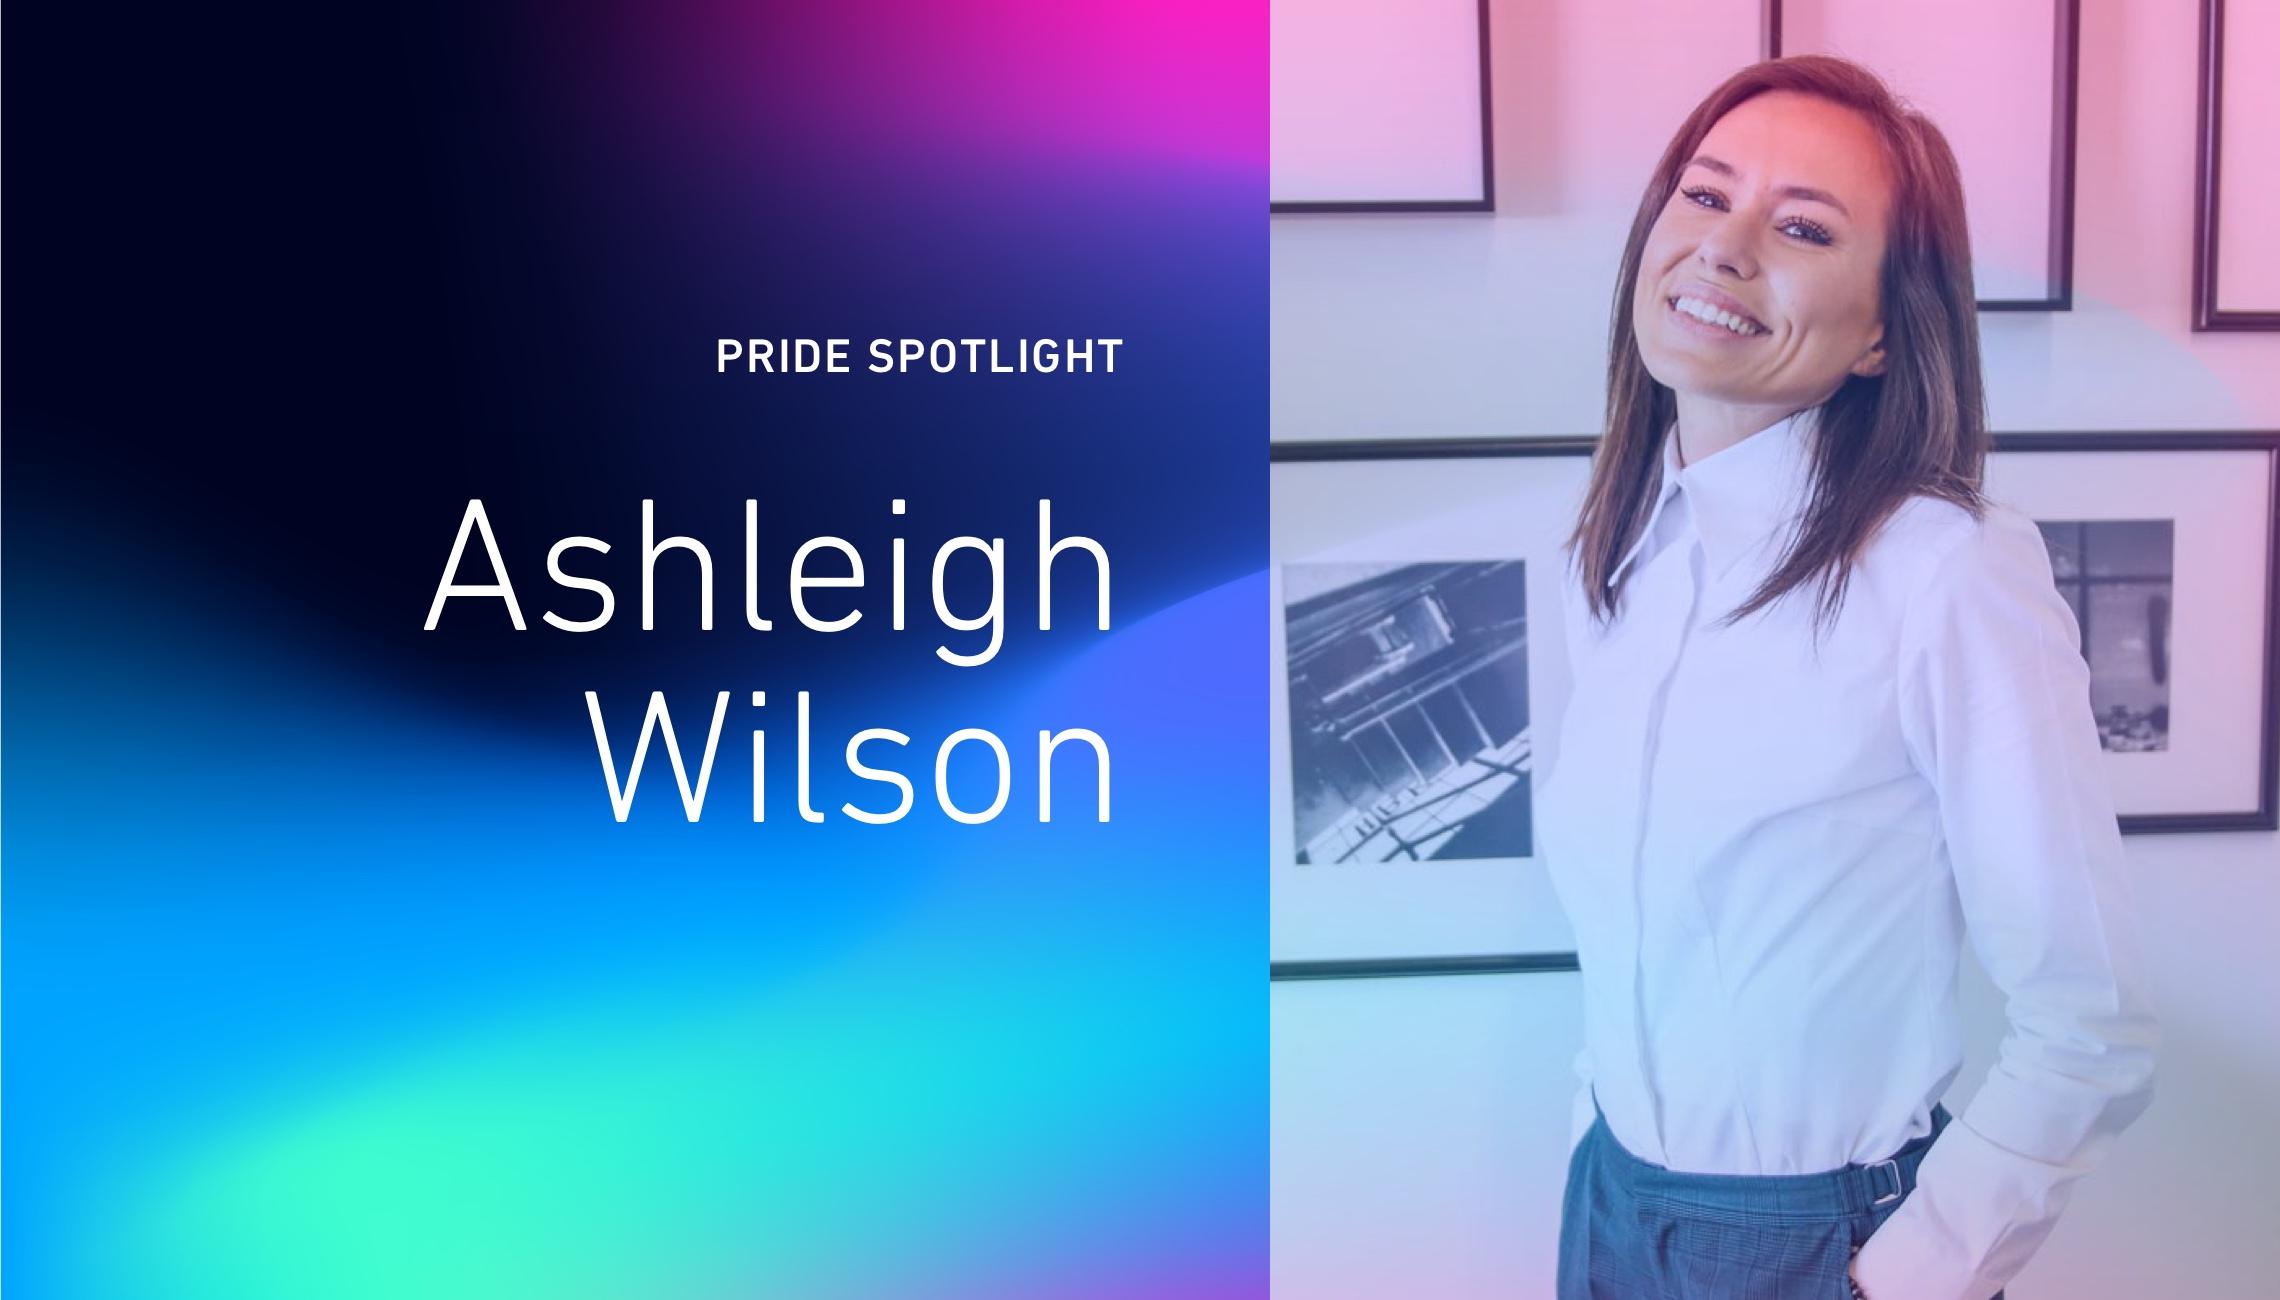 Pride Spotlight: Ashleigh Wilson